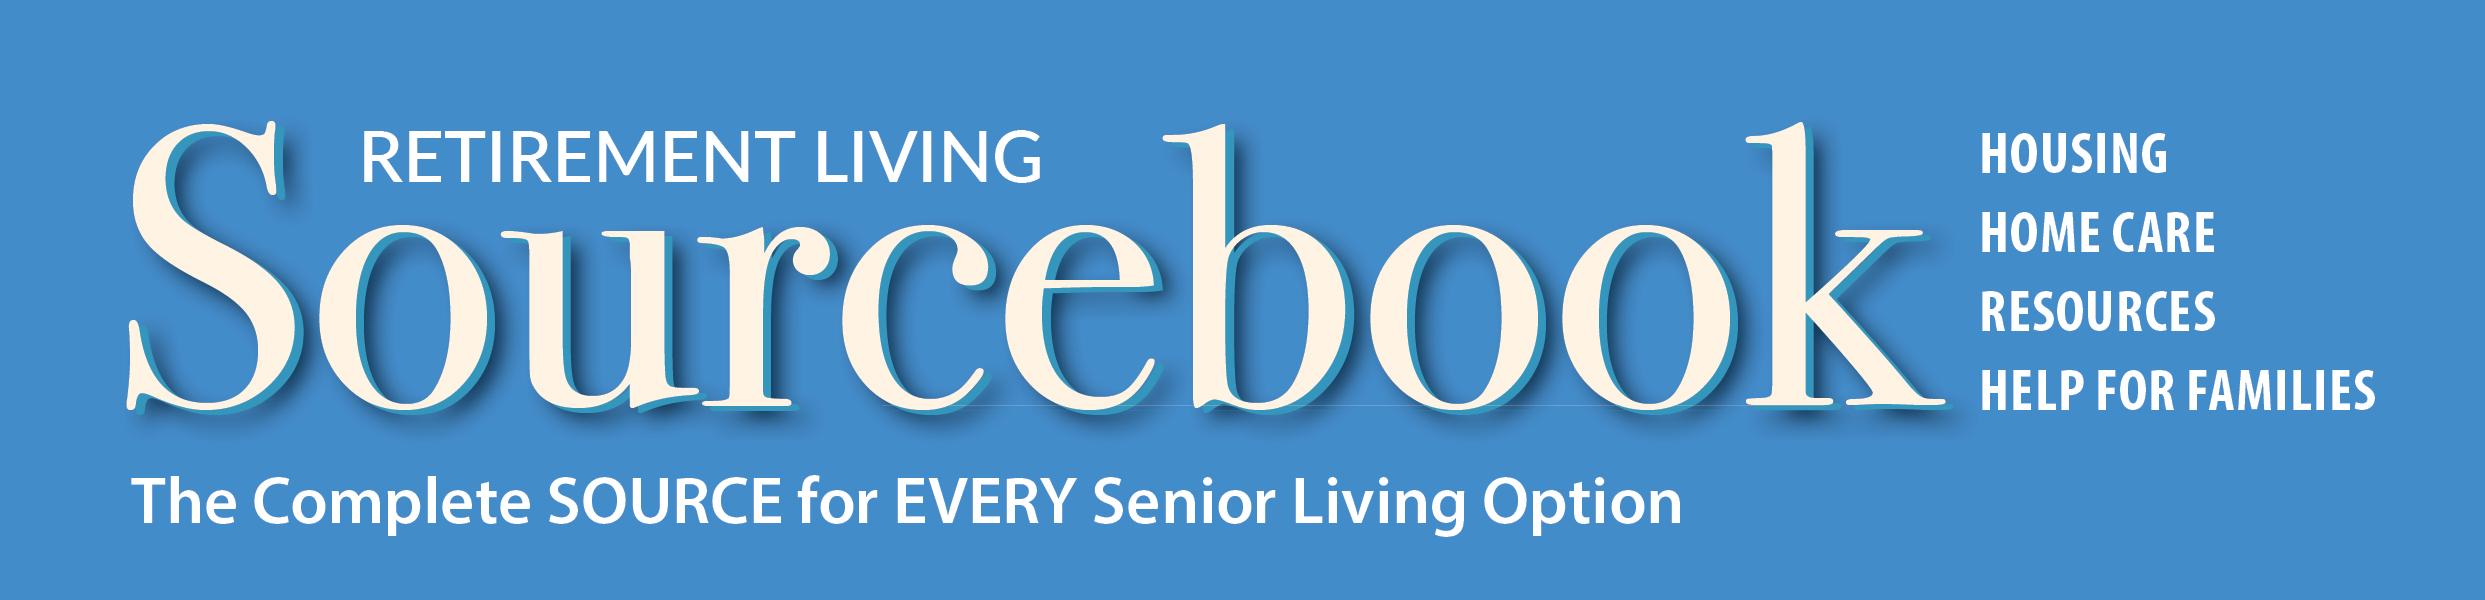 retirement living